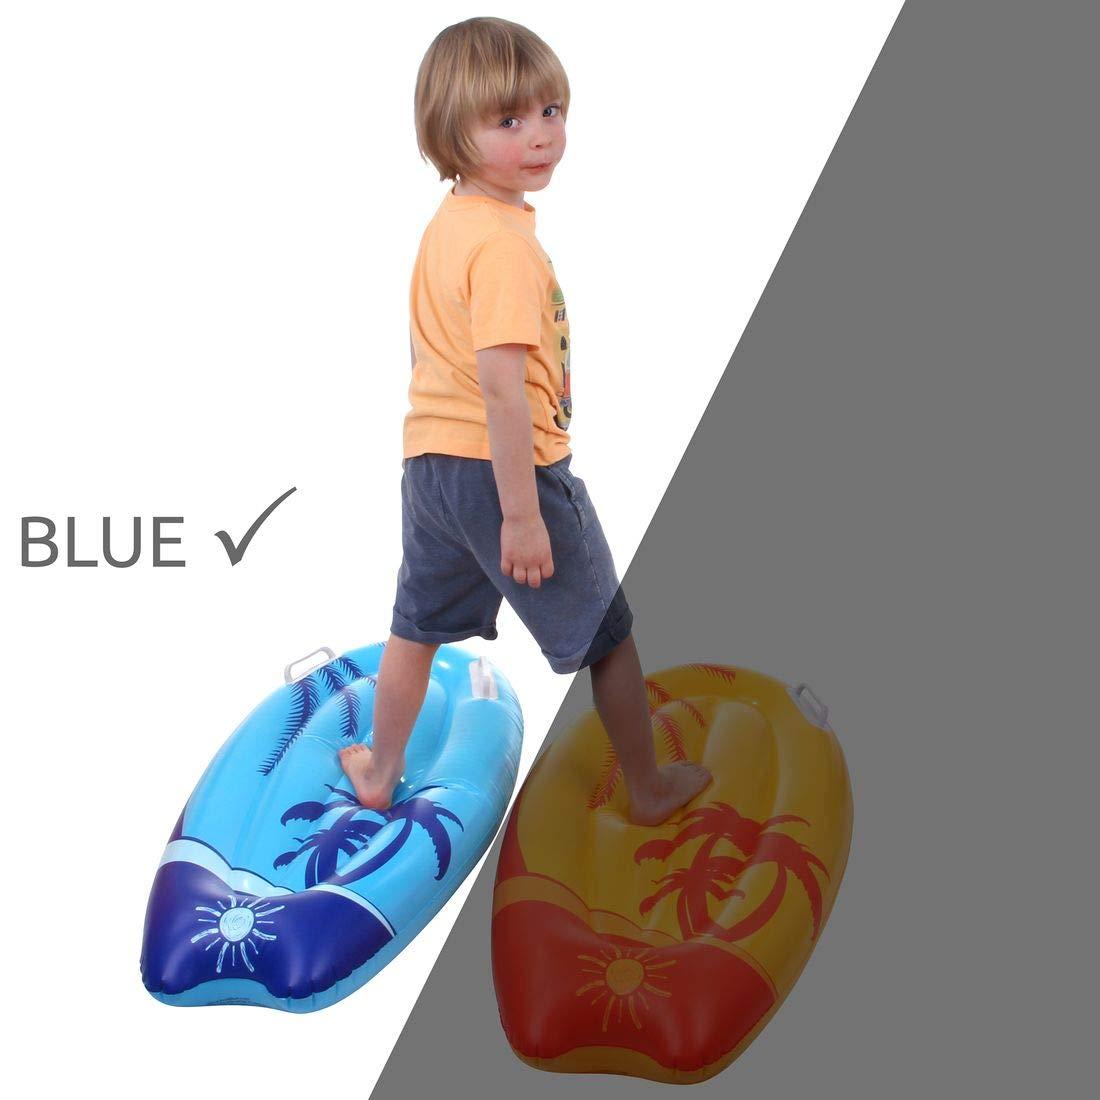 Jilong Kick-Board Blue Wave Wakeboard 95x45x15 cm Schwimmbrett Surfbrett Wellenreiter Luftmatratze